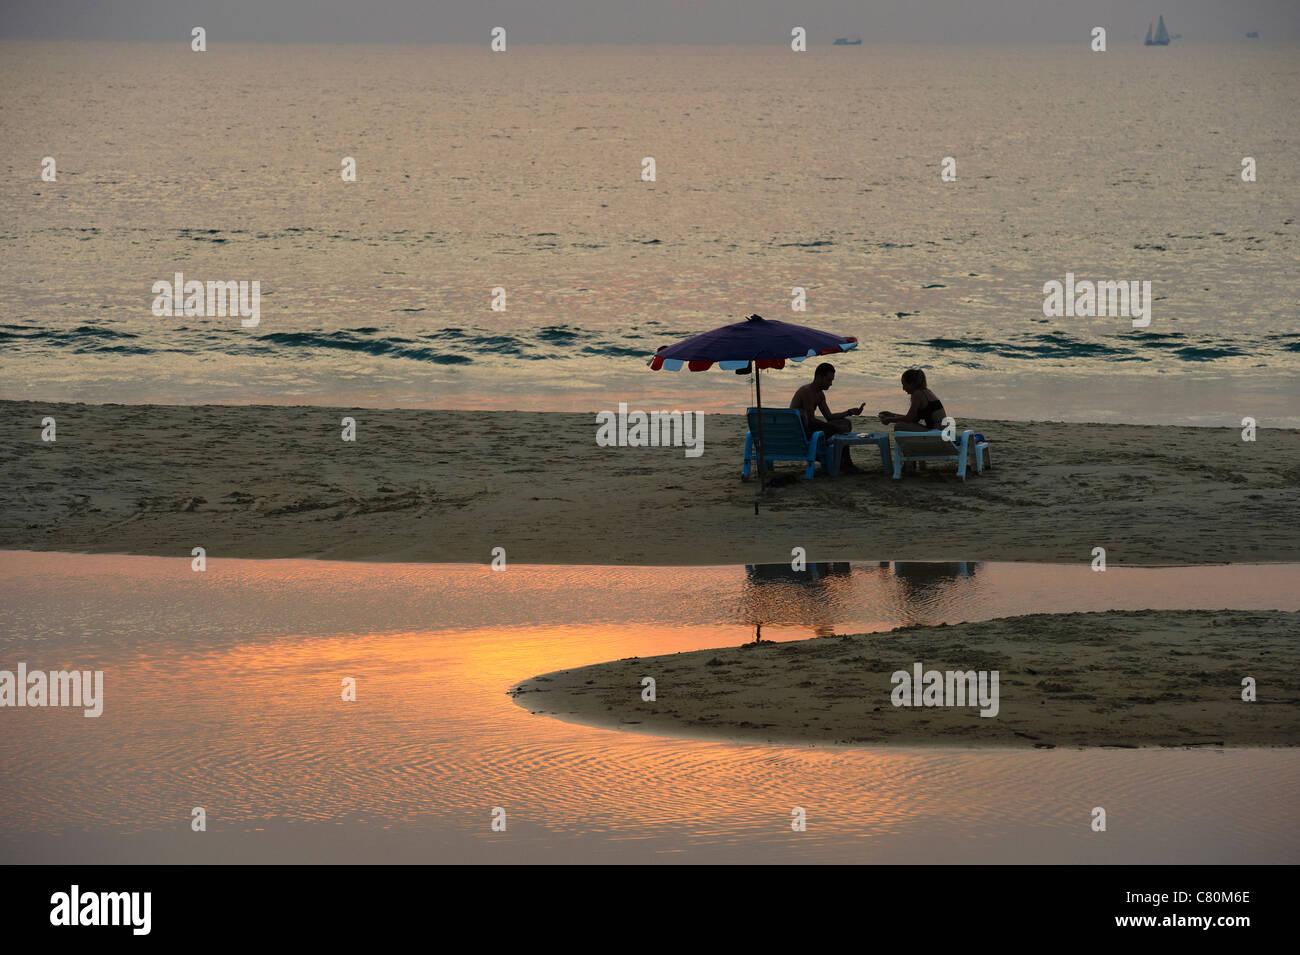 Thailand, Phuket island, Karon Beach at Sunset - Stock Image